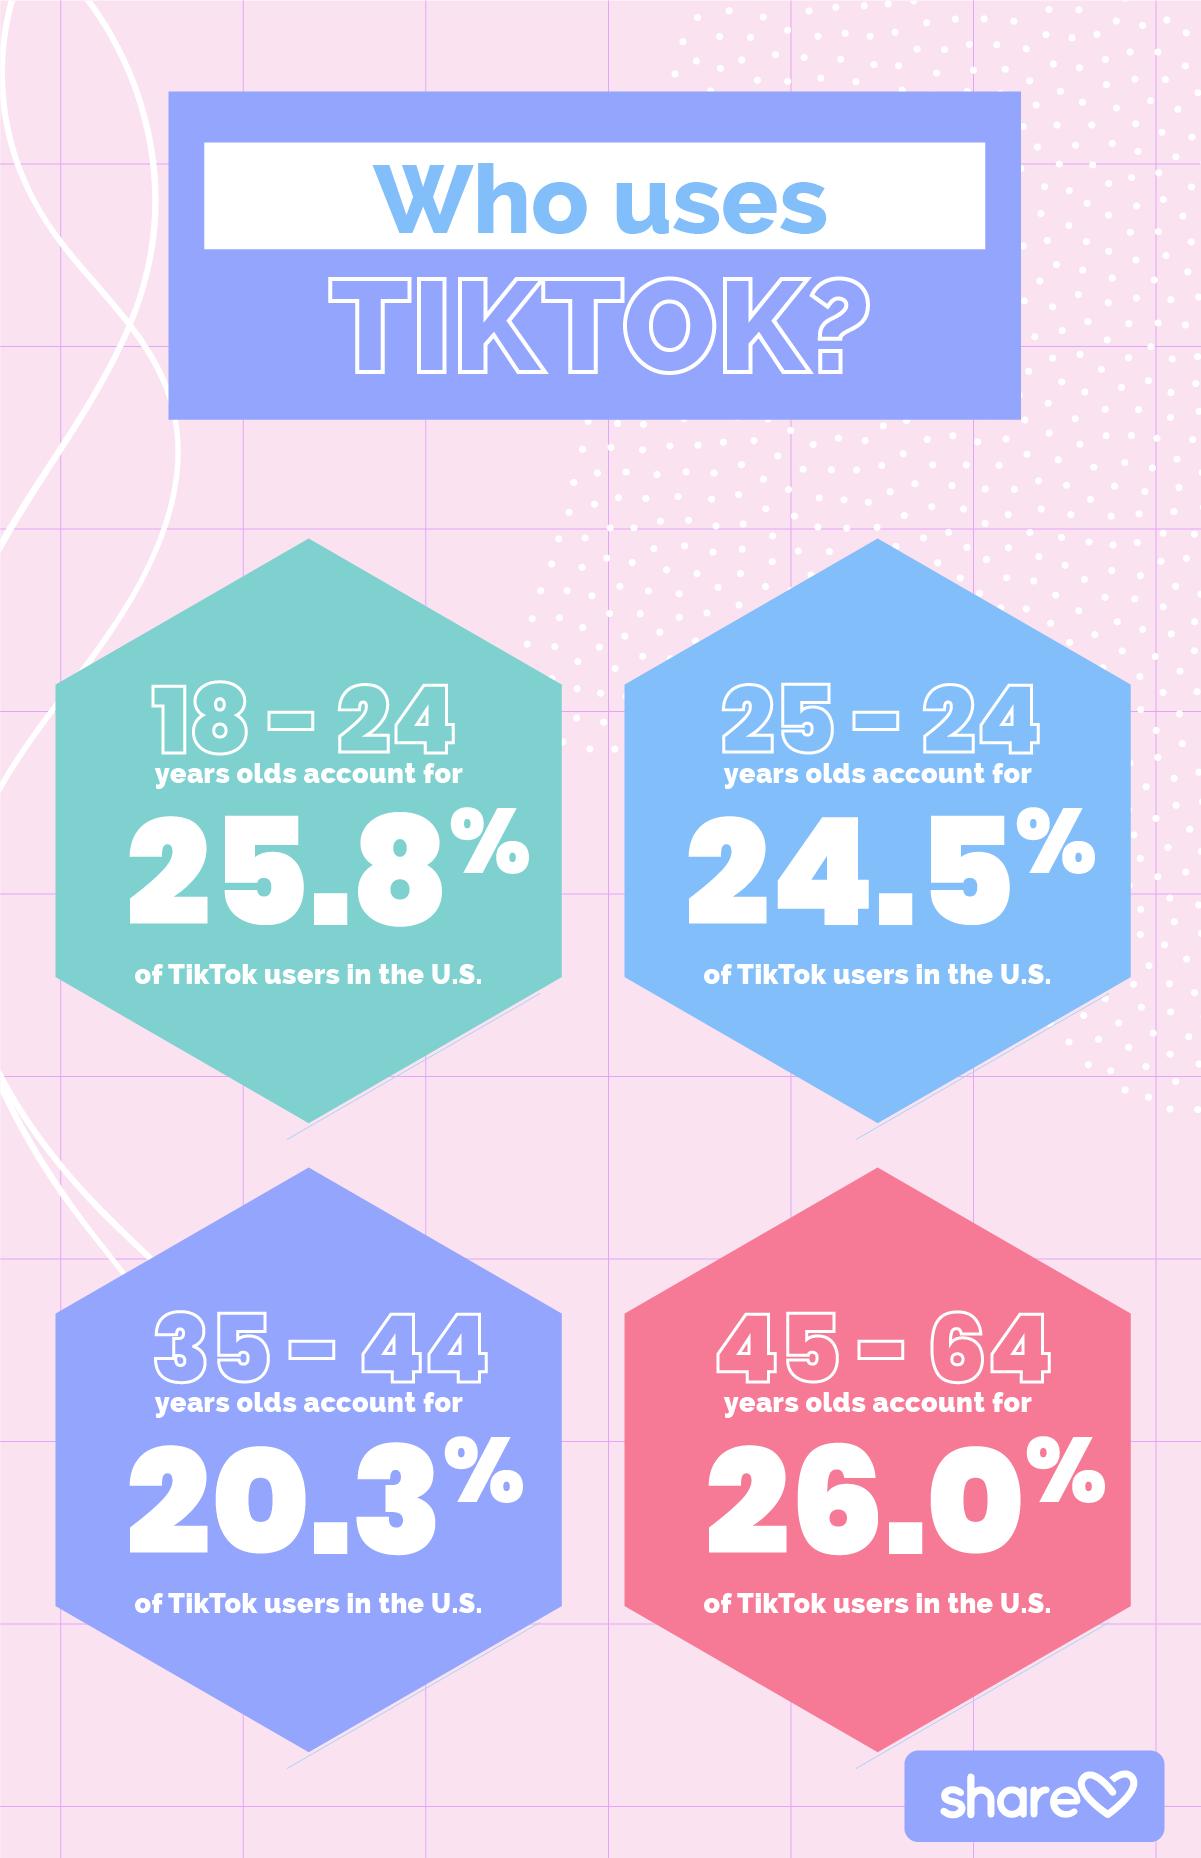 Who uses TikTok?